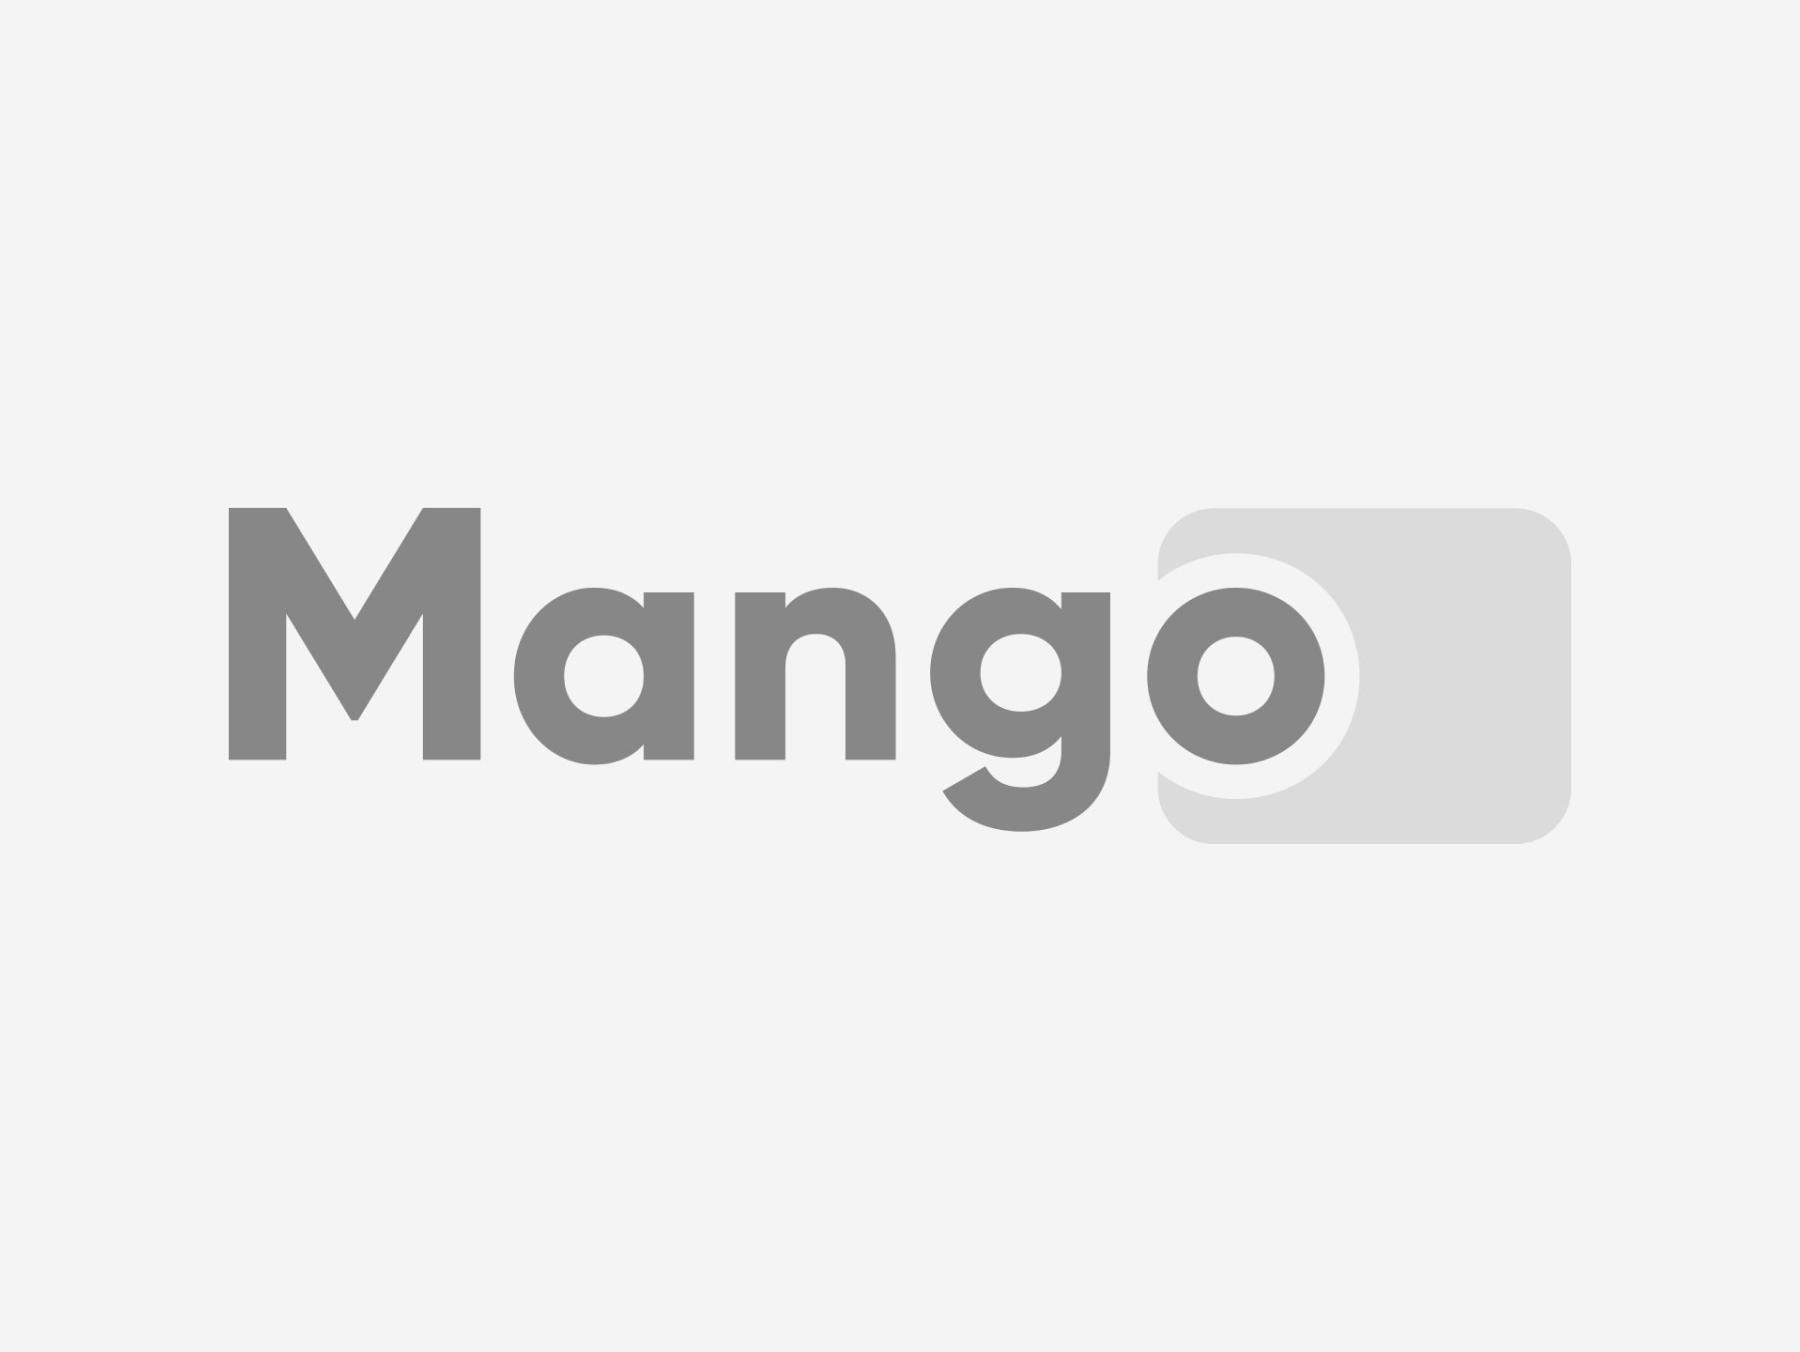 Paleta Tenis de masa Donic-schildkrot Top Team 500 Bat